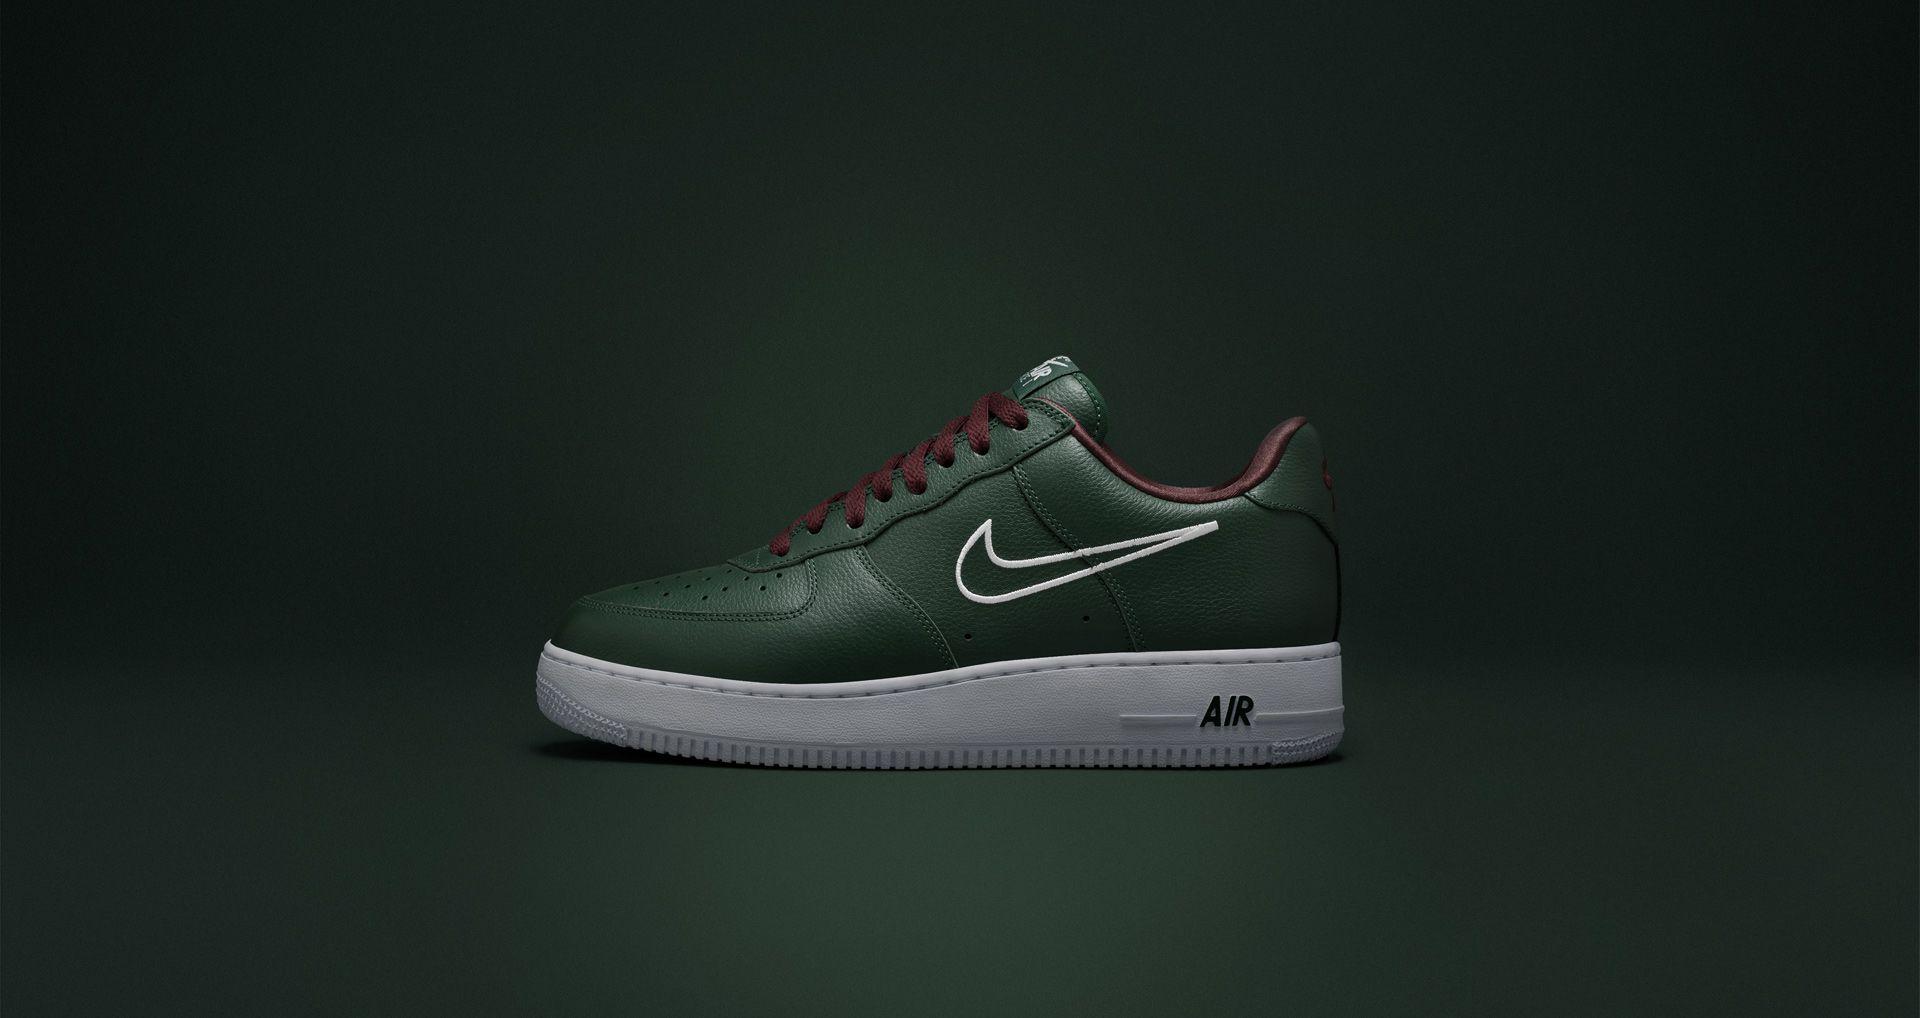 Nike B 'hong 2018 Kong' 1 Force Air DateNike Release bfg67vYy